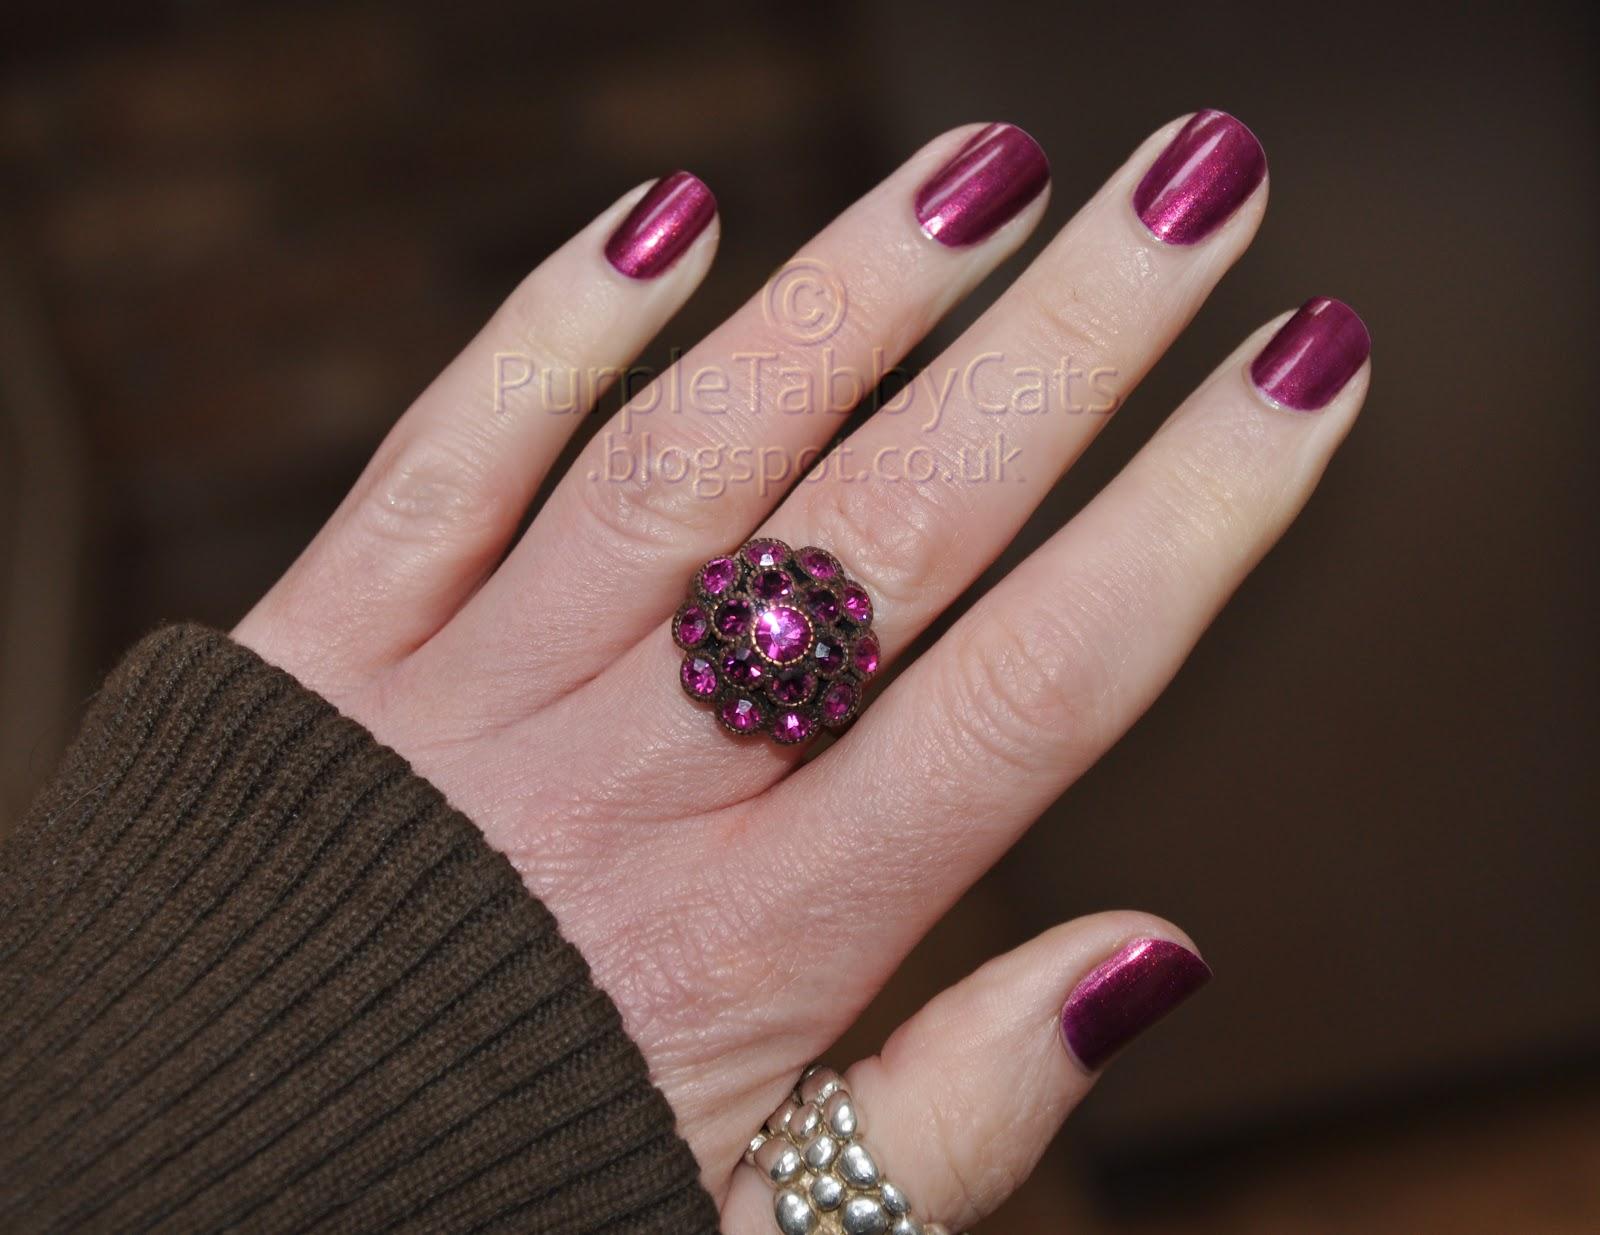 Opi nail lacquer diva of geneva nail ftempo - Diva nails roma ...